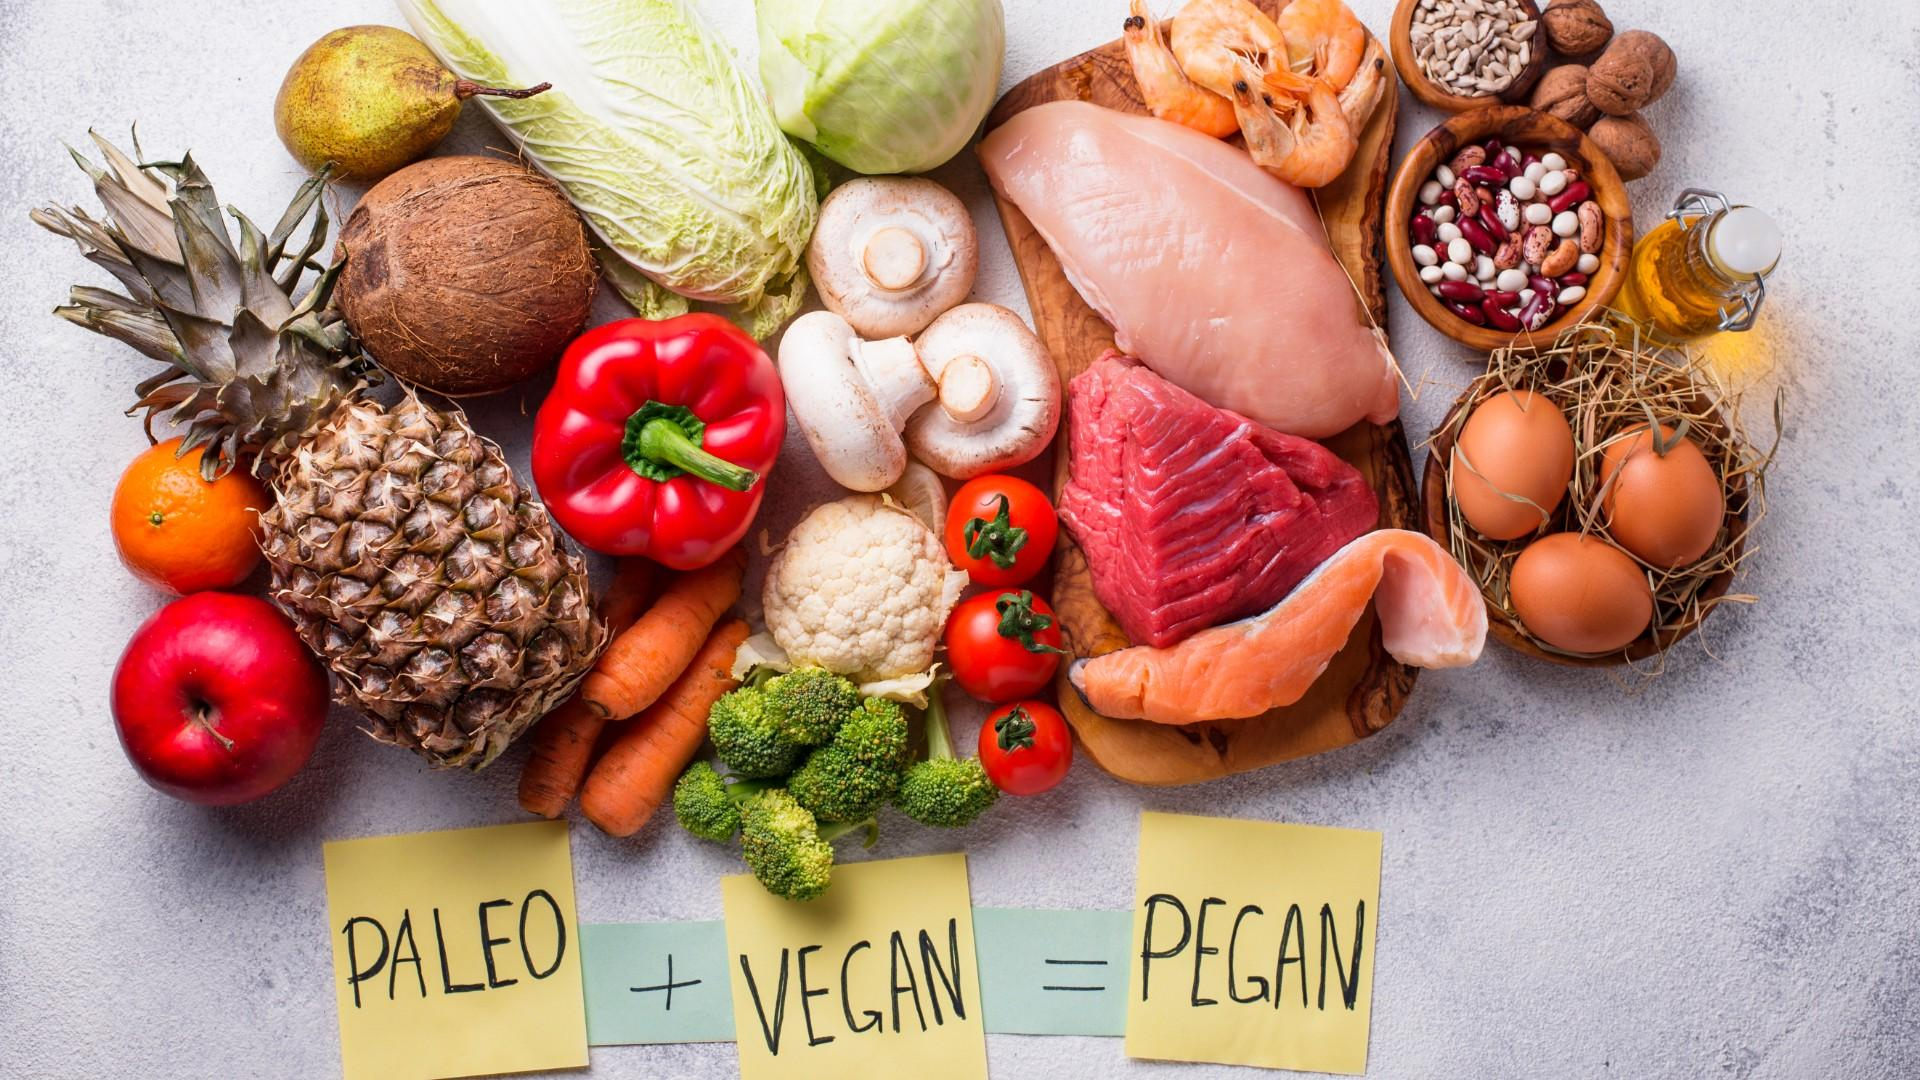 types of diets vegan paleo